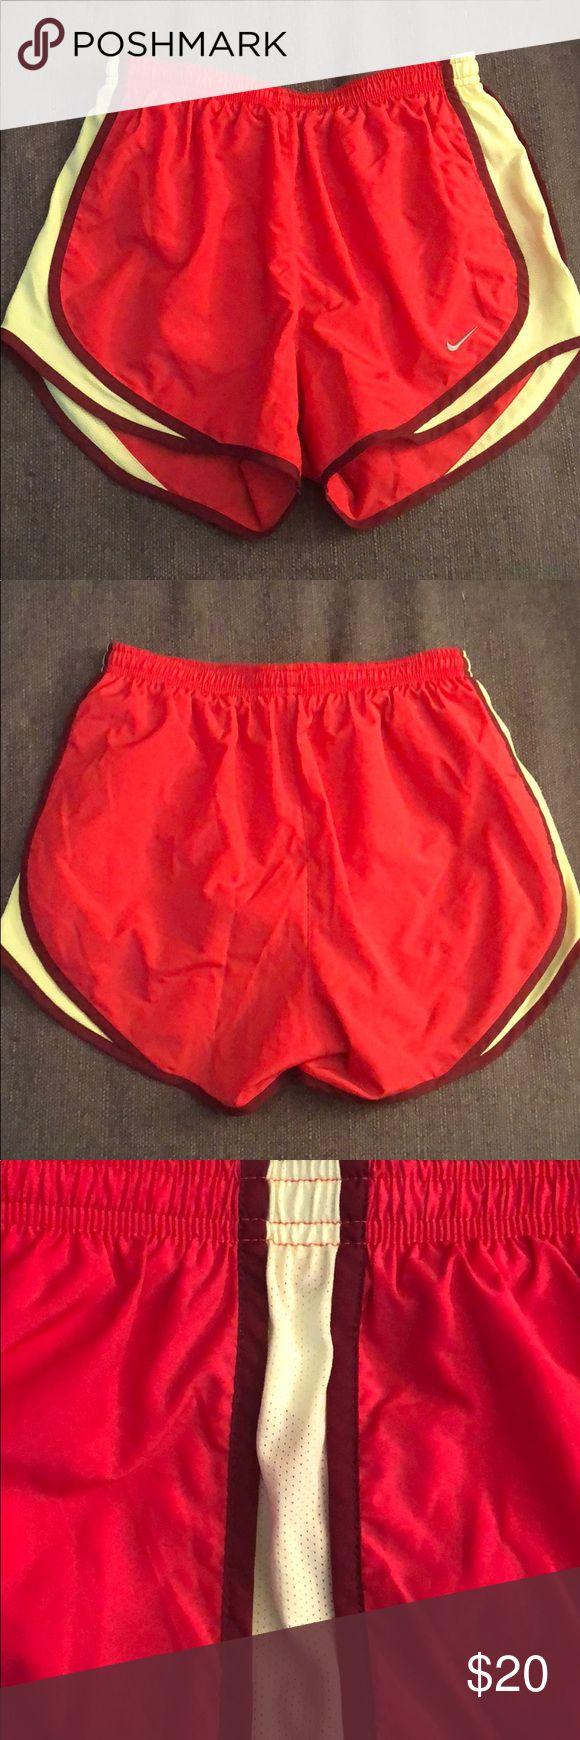 Nike Shorts Klassische Nike Laufshorts – in gutem Zustand Nike Shorts   – My Posh Picks